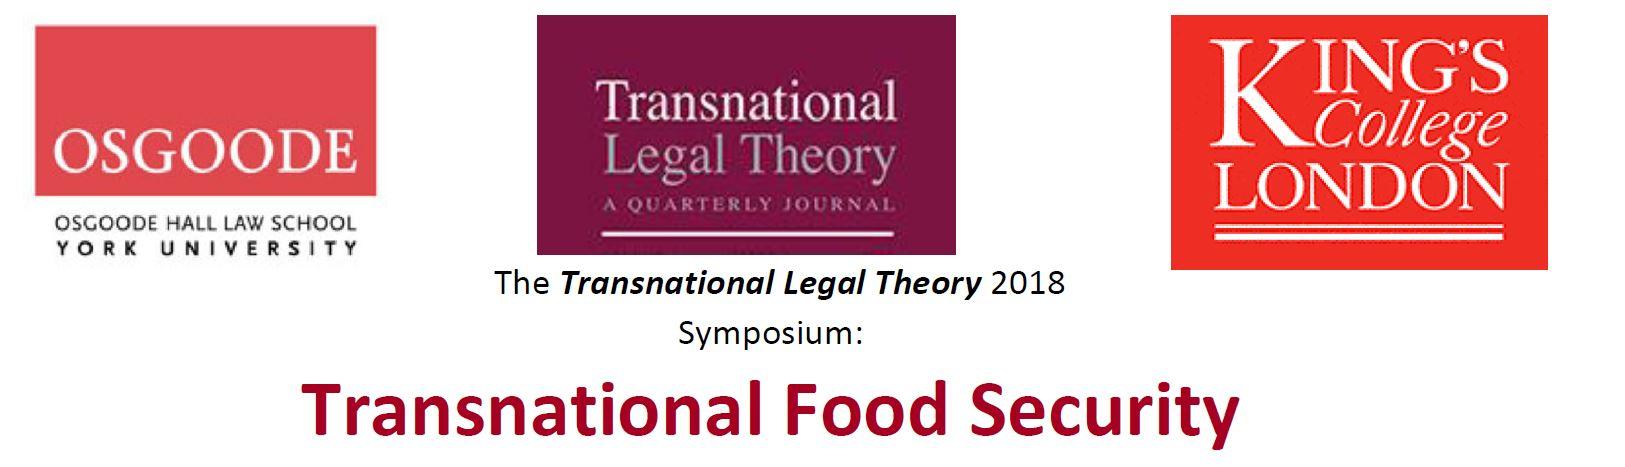 transnational food security.JPG